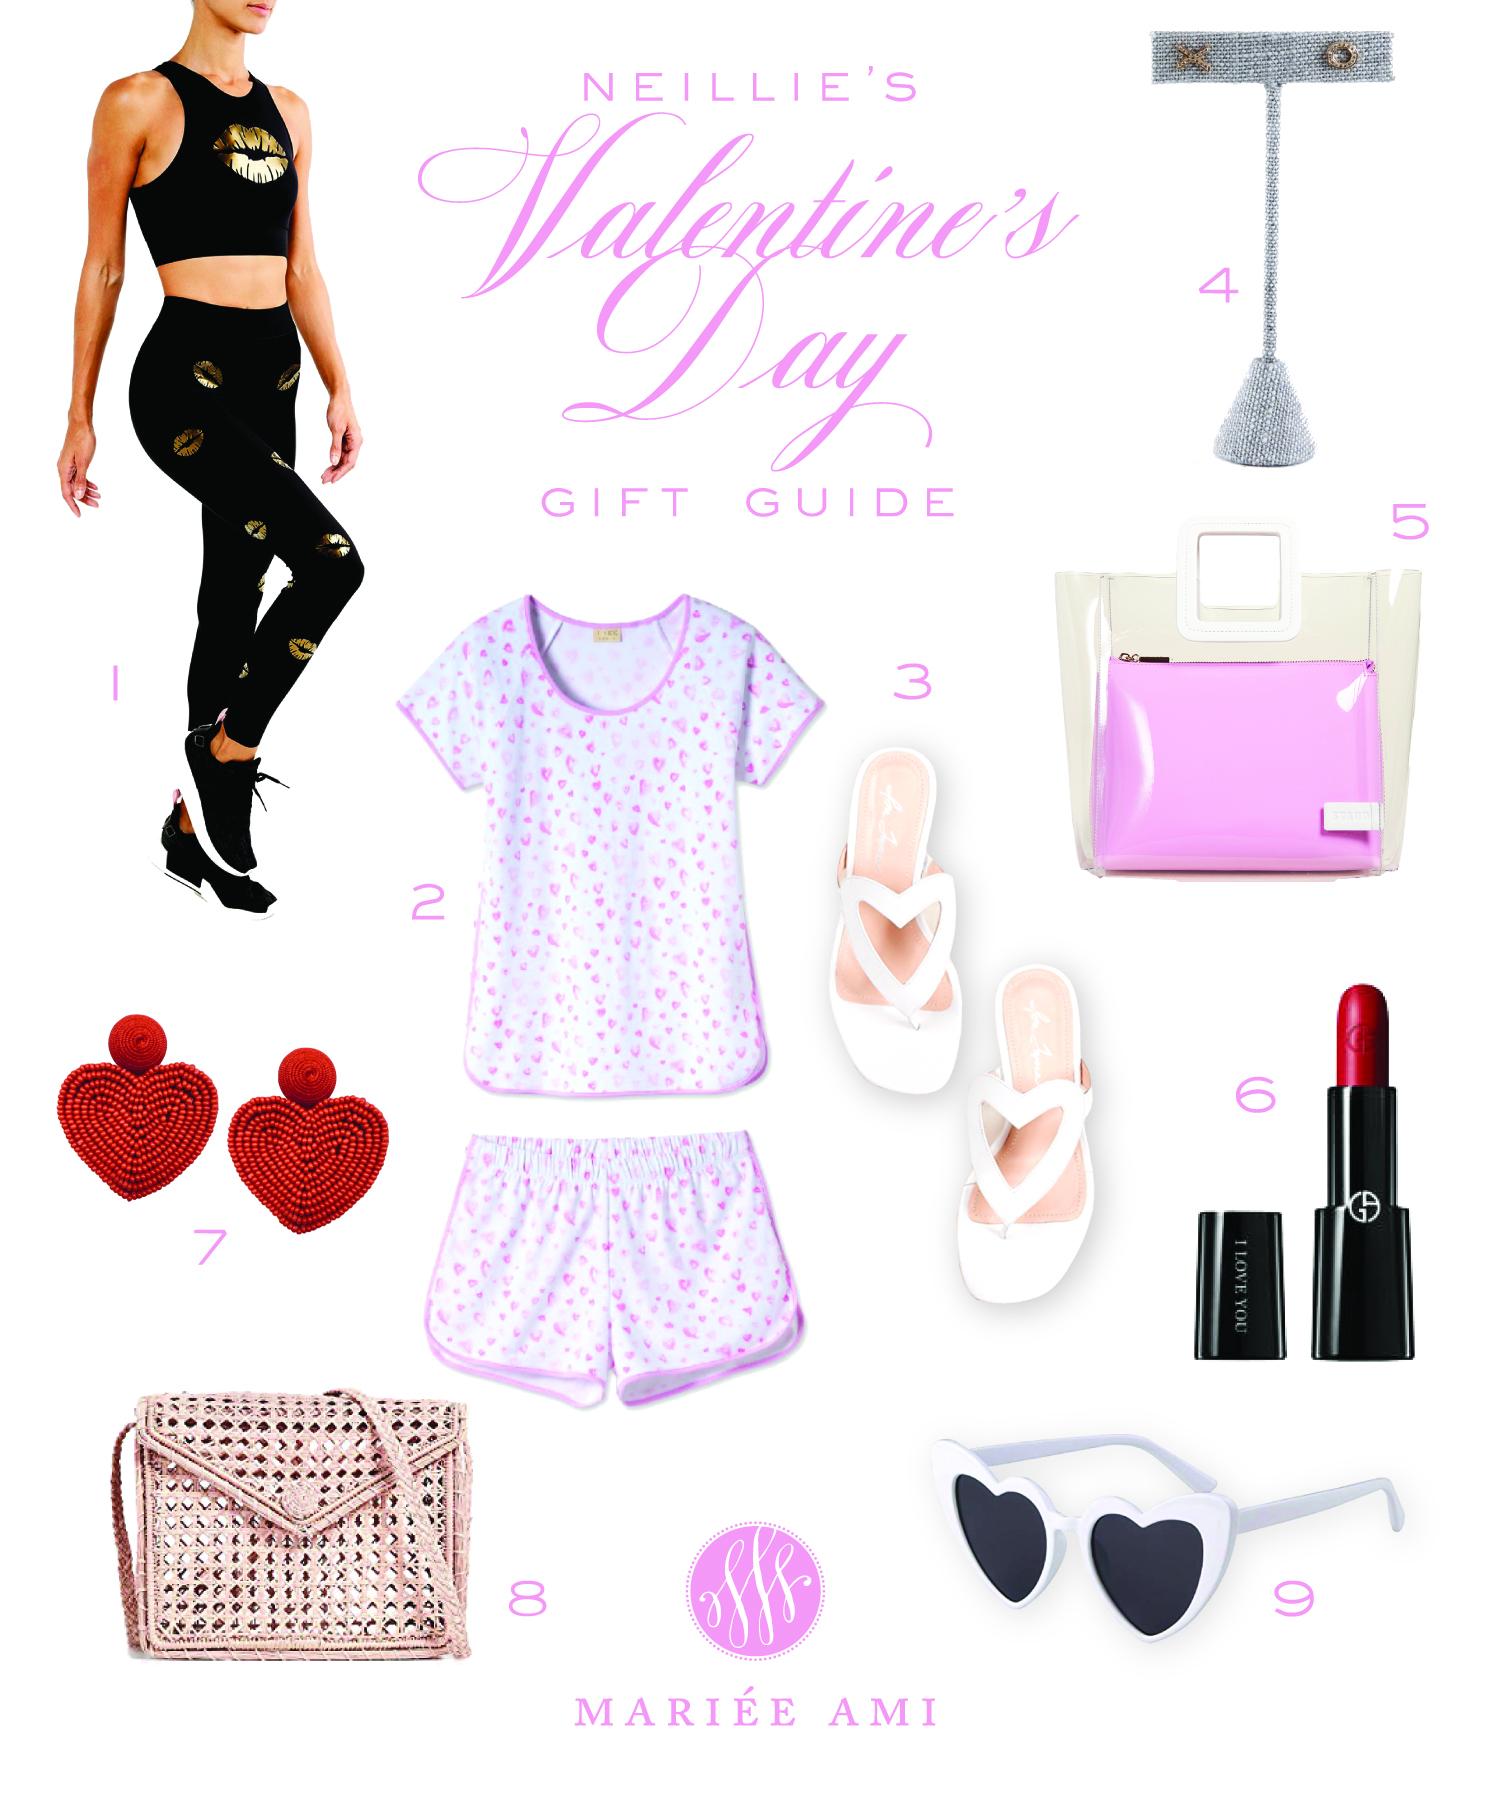 Neillie Butler's Valentine Gift Guide